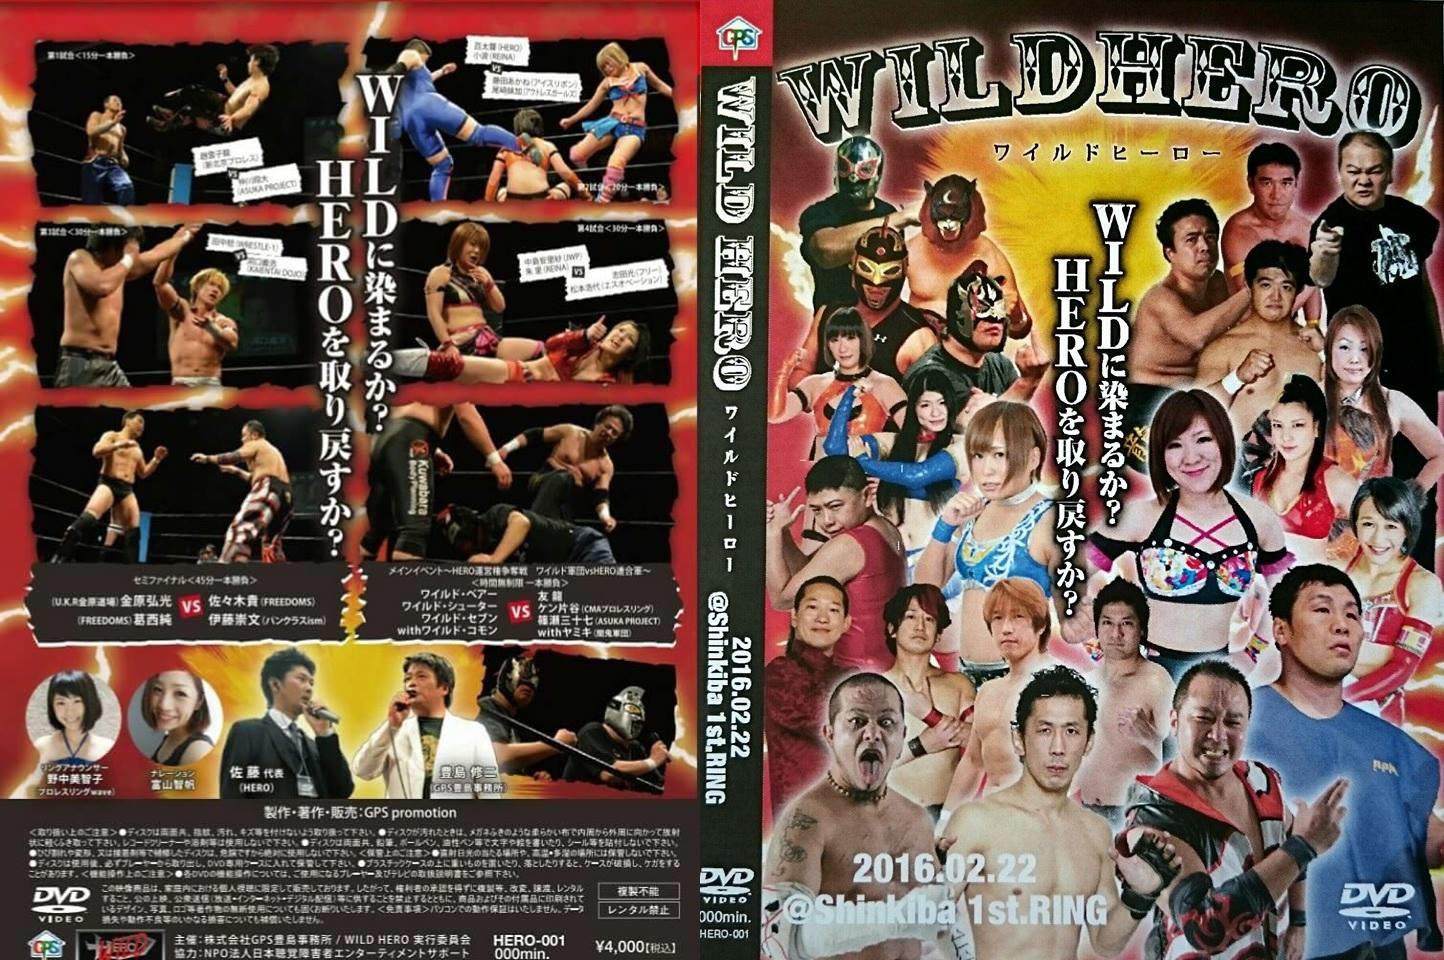 WILD HERO DVDジャケット